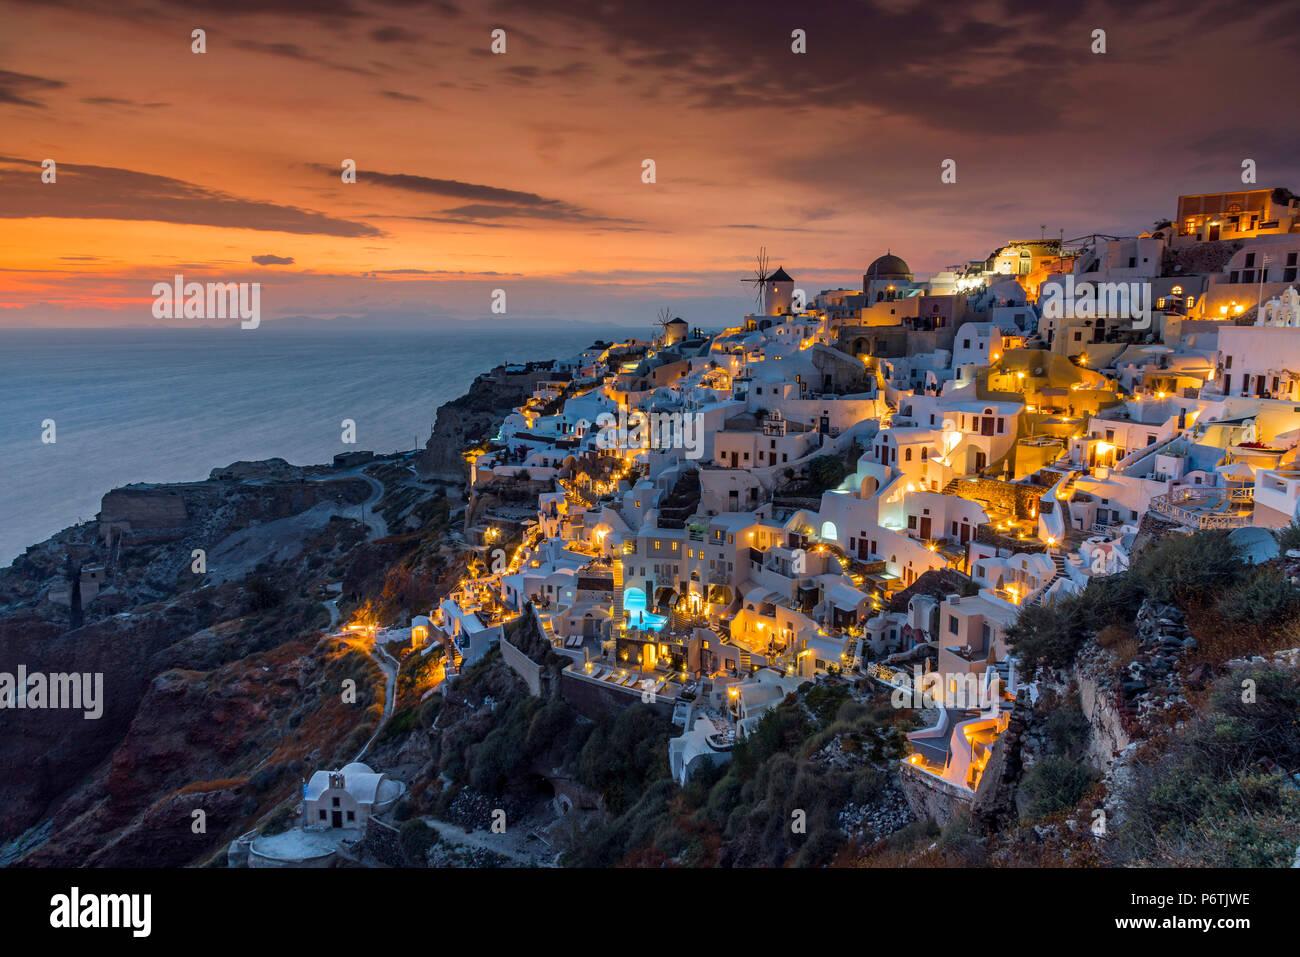 Blick auf den Sonnenuntergang, Oia, Santorini, Süd Ägäis, Griechenland Stockbild